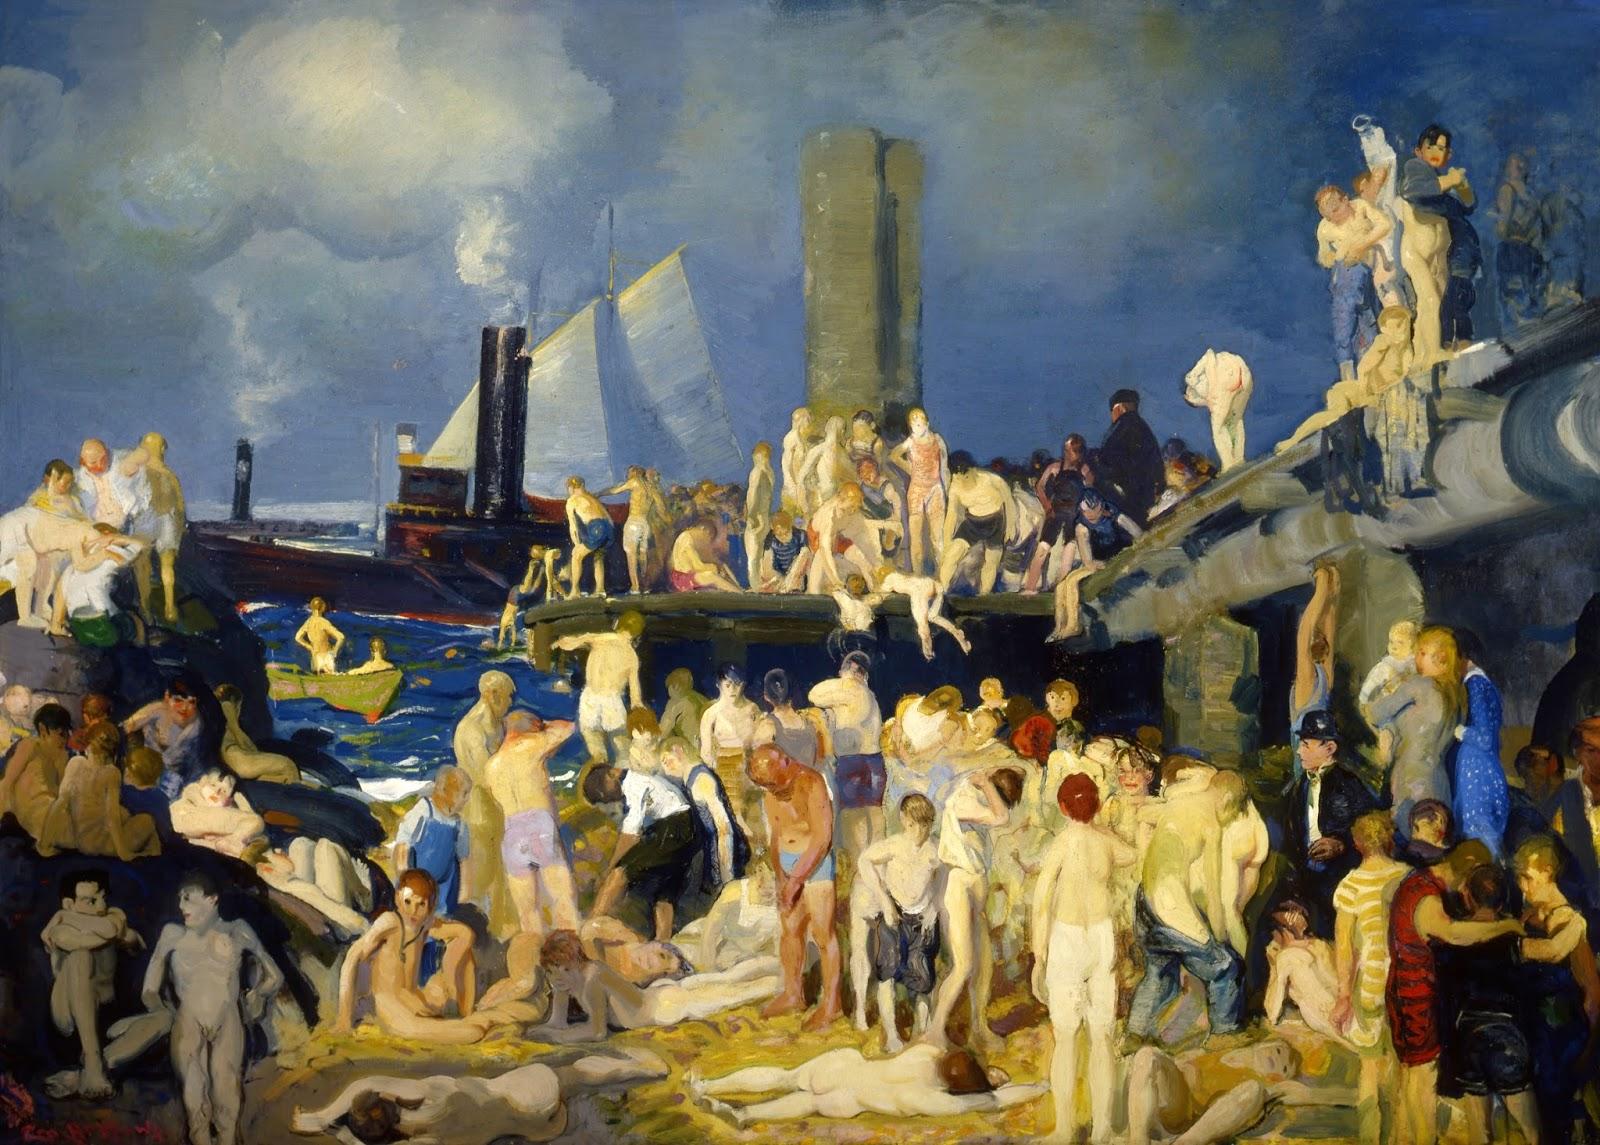 vghuioew: George Bellows